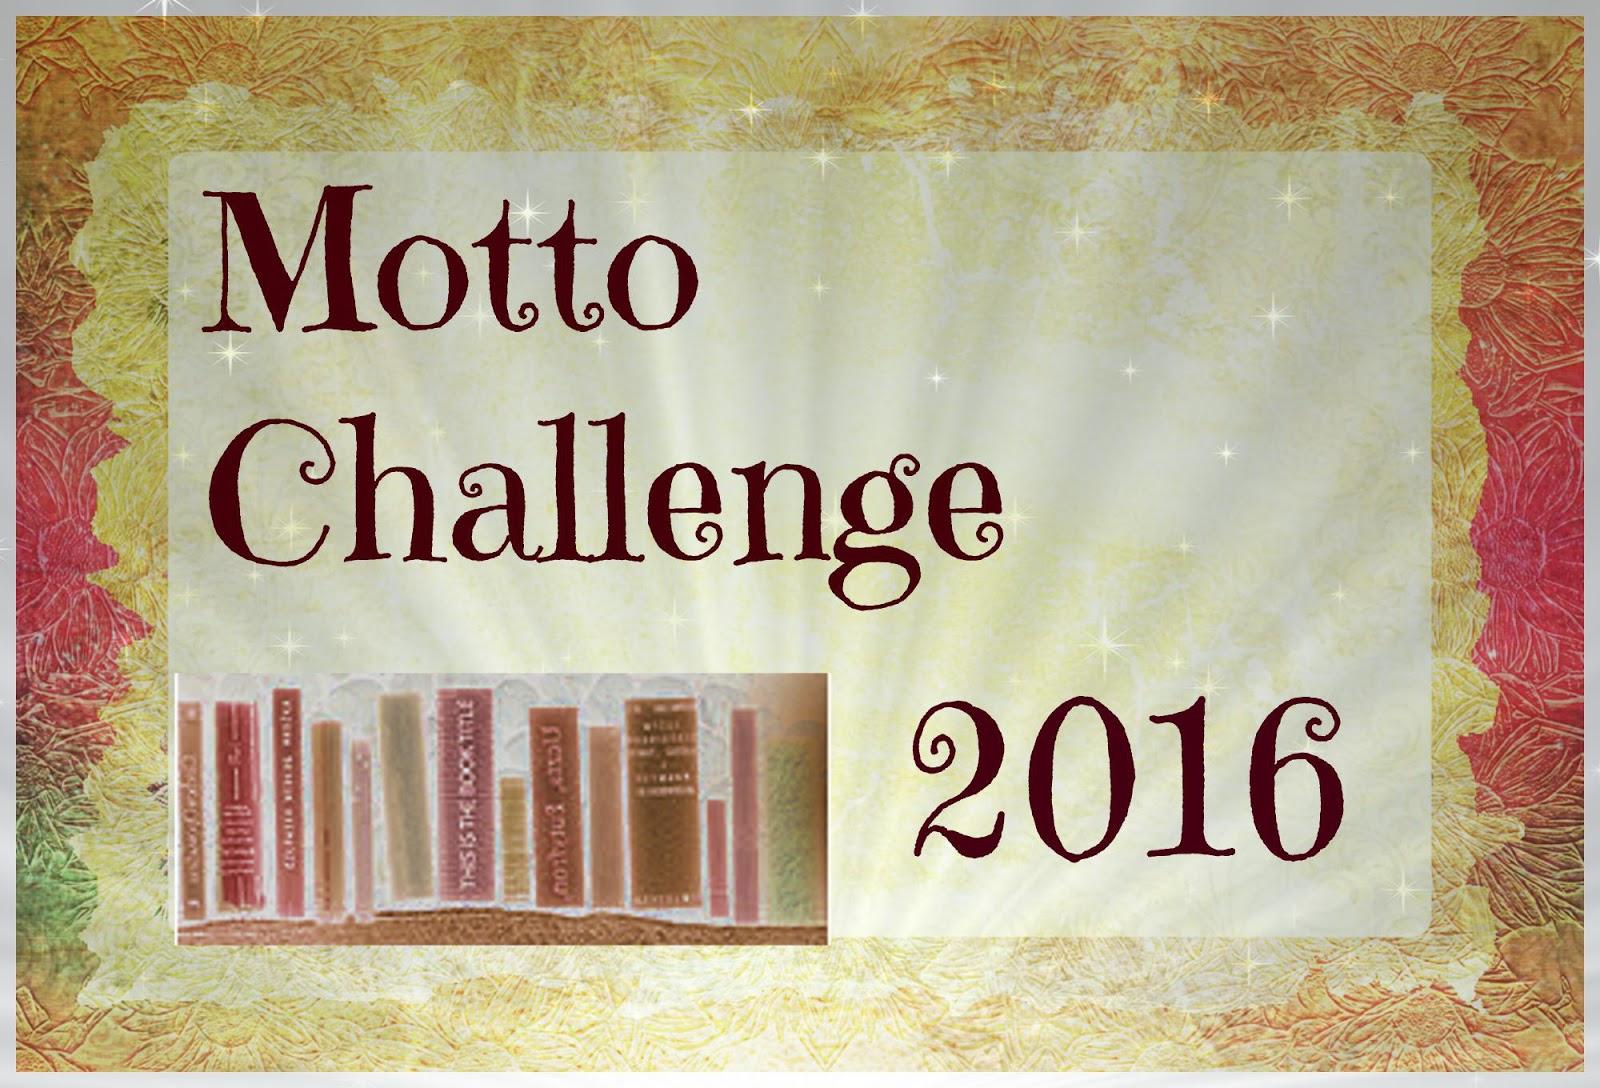 http://juliassammelsurium.blogspot.com/2015/12/challenge-motto-challenge.html